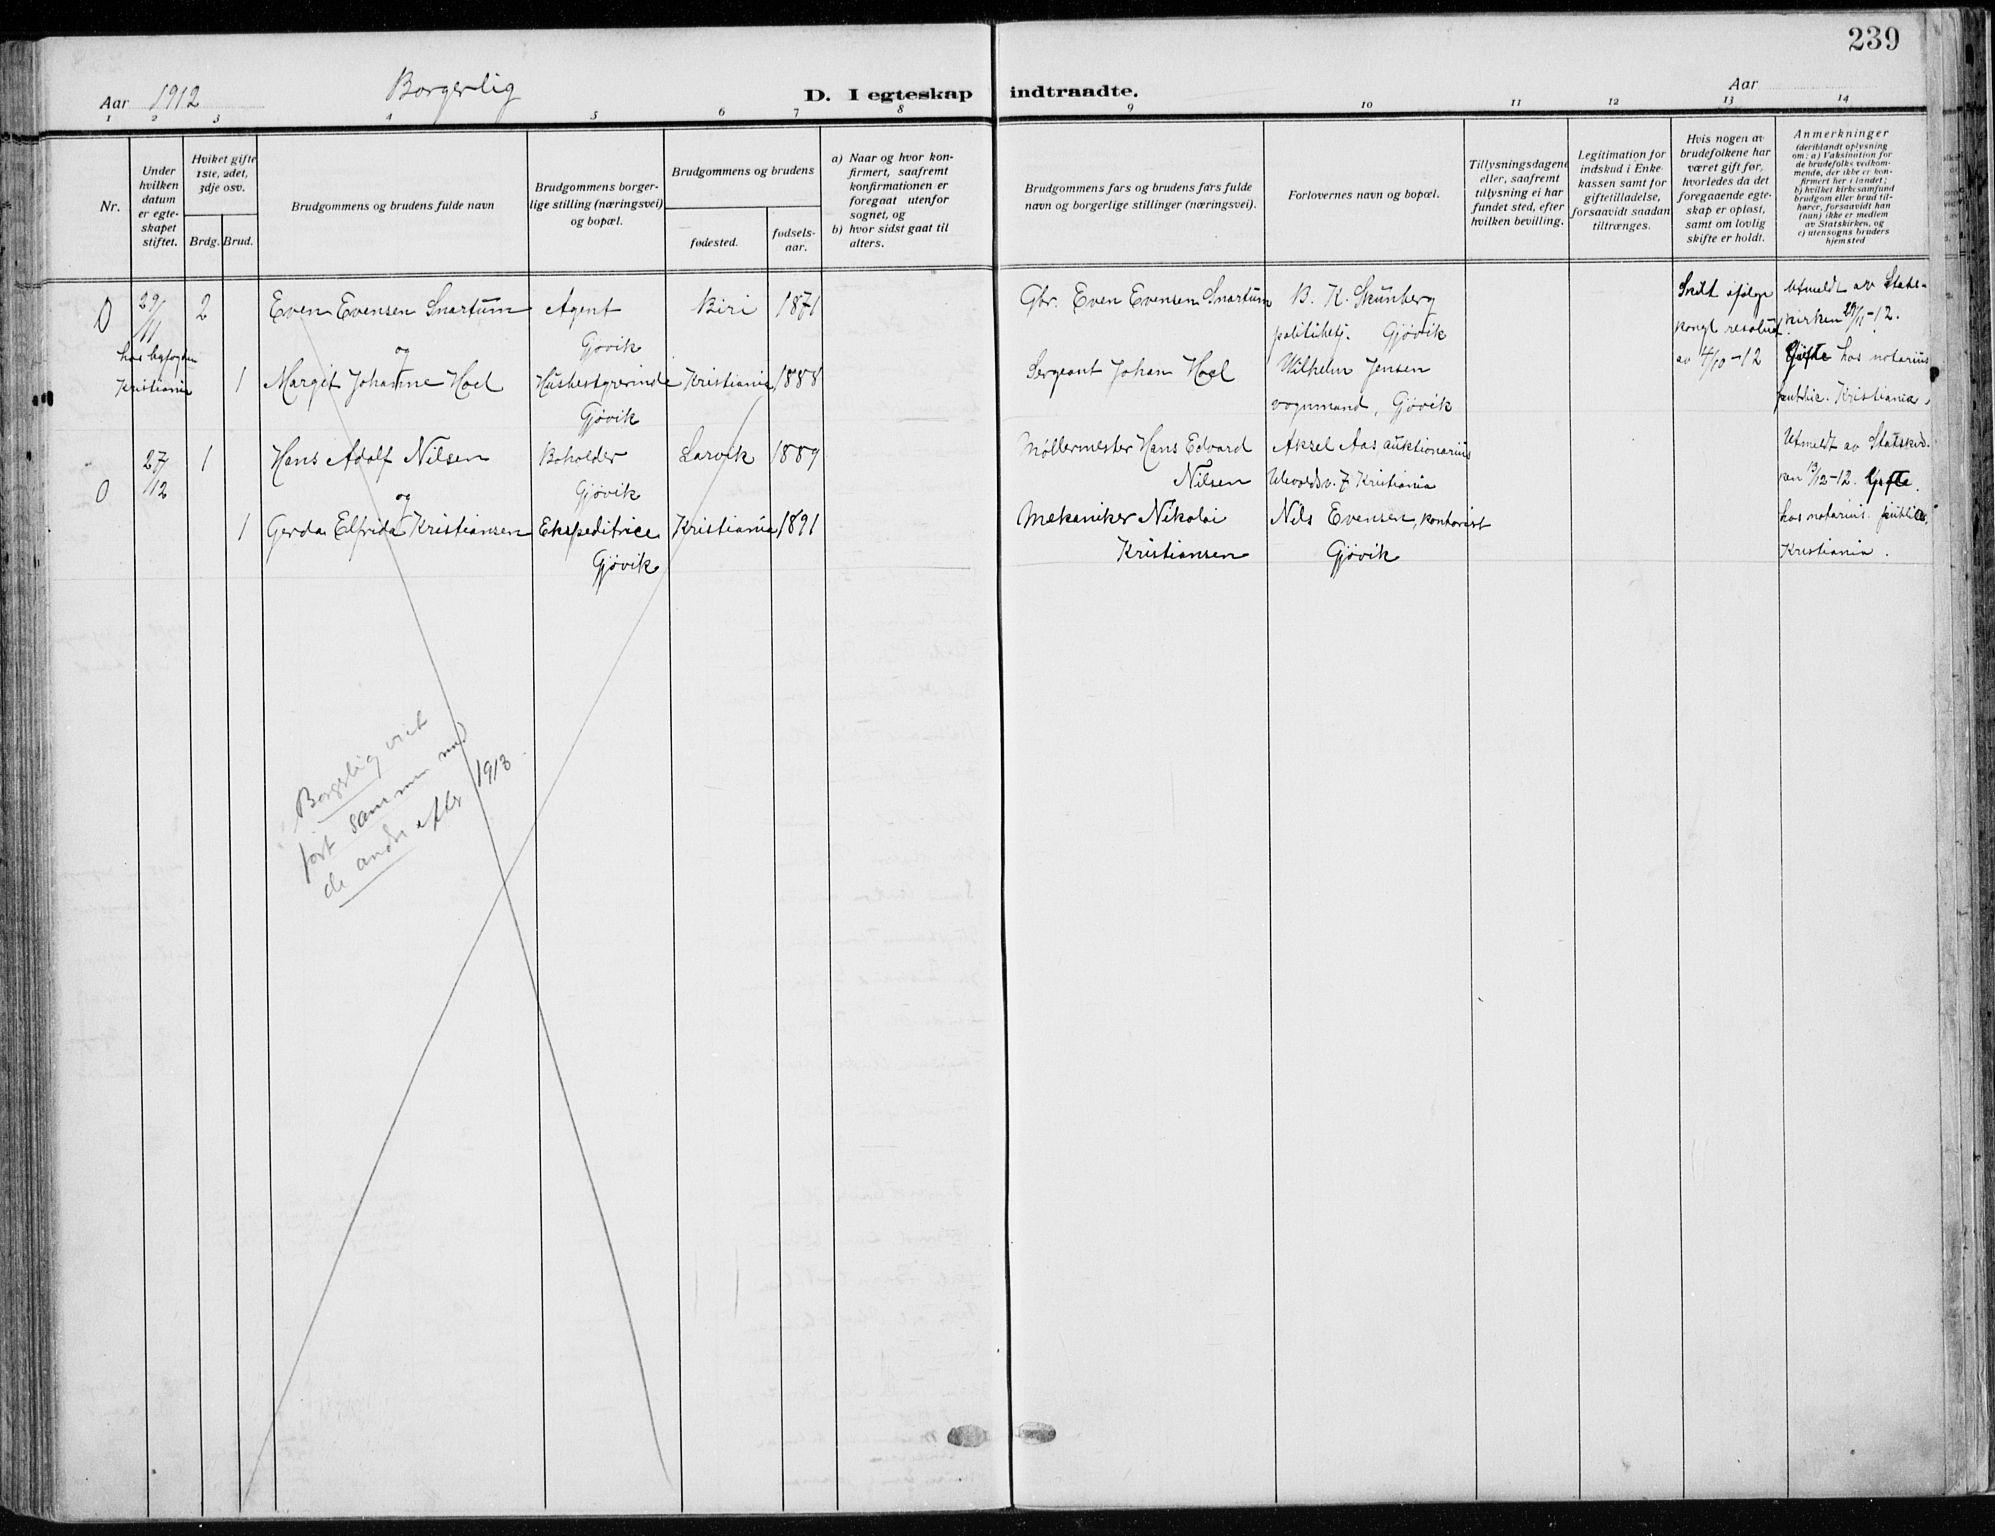 SAH, Vardal prestekontor, H/Ha/Haa/L0014: Ministerialbok nr. 14, 1912-1922, s. 239